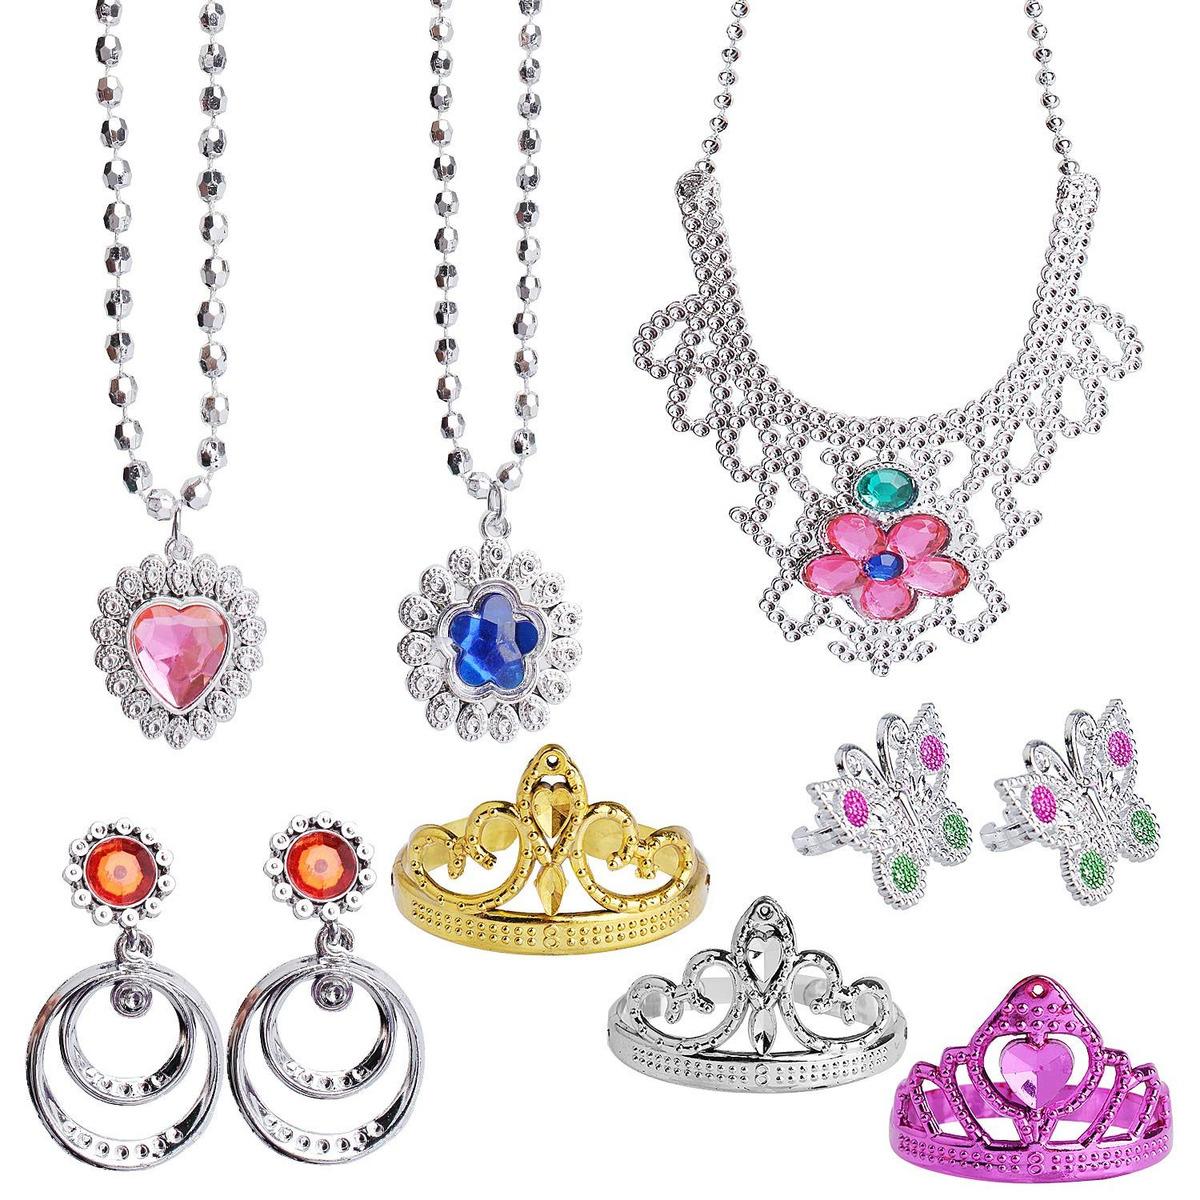 Hicdaw 71 Princesa Joyas Pretender Niña Piezas Juguete Pr 7by6Ygvf